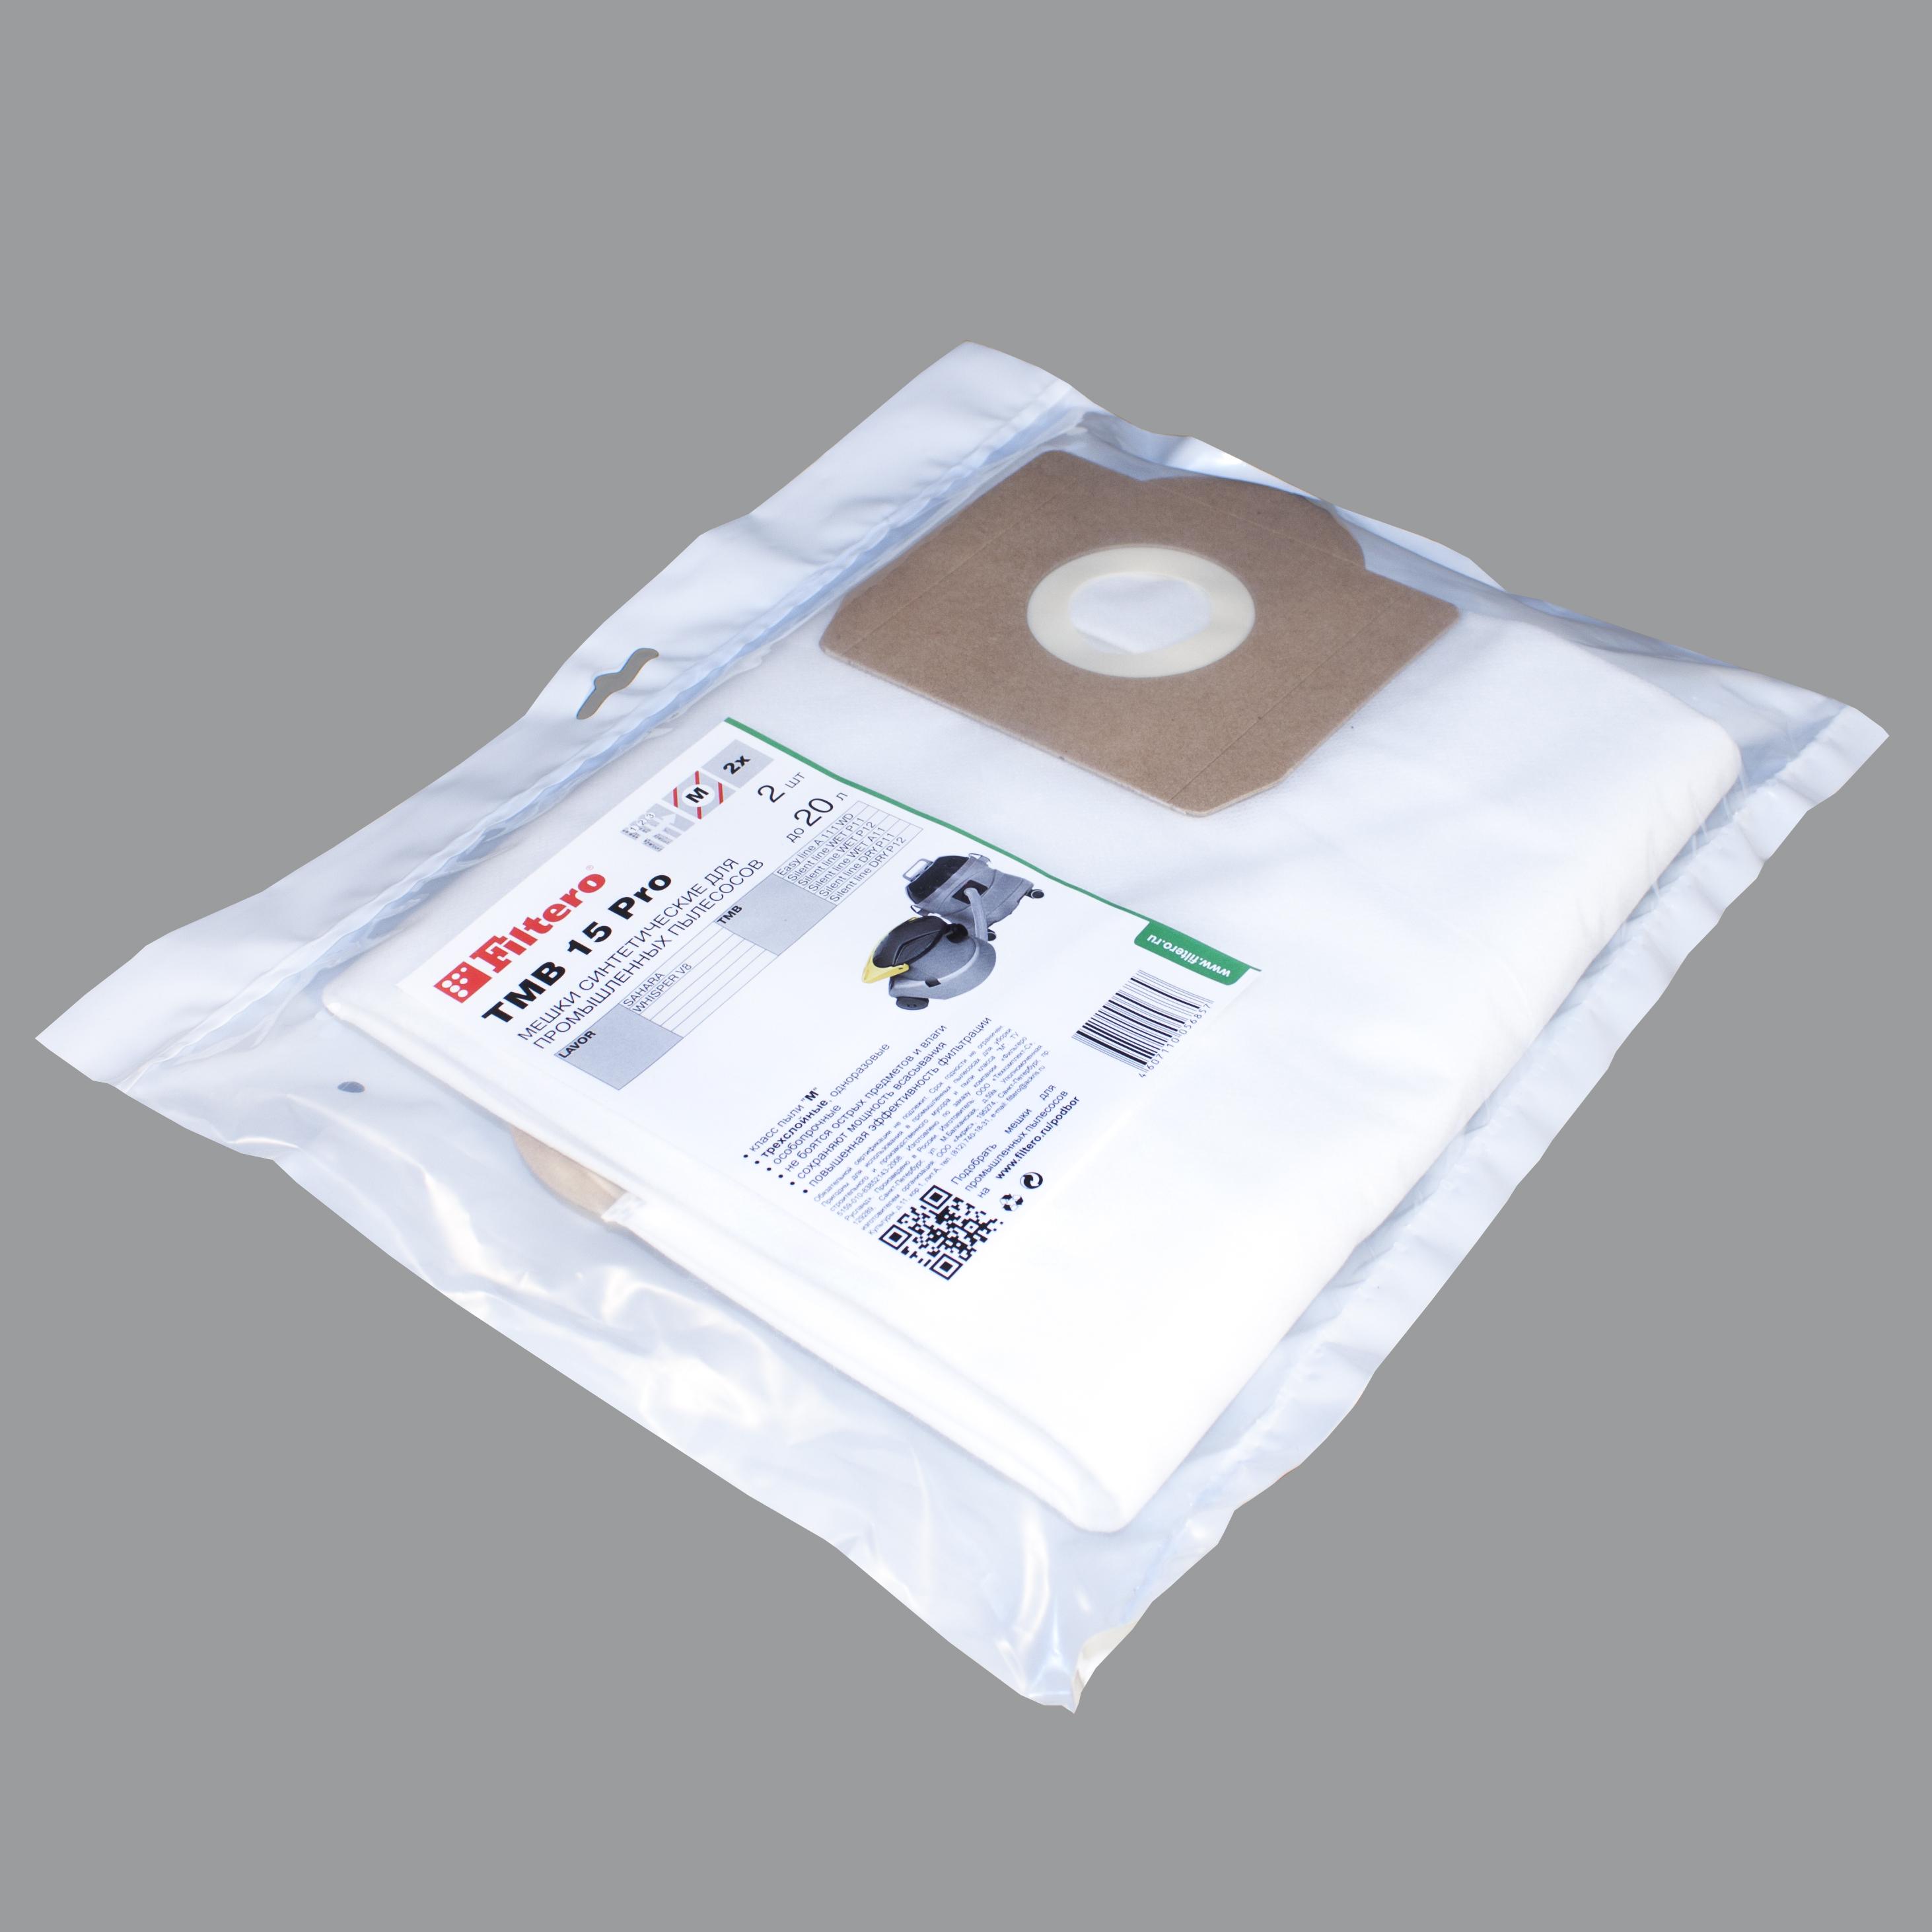 Мешок Filtero Tmb 15 pro мешок пылесборник filtero row 08 экстра